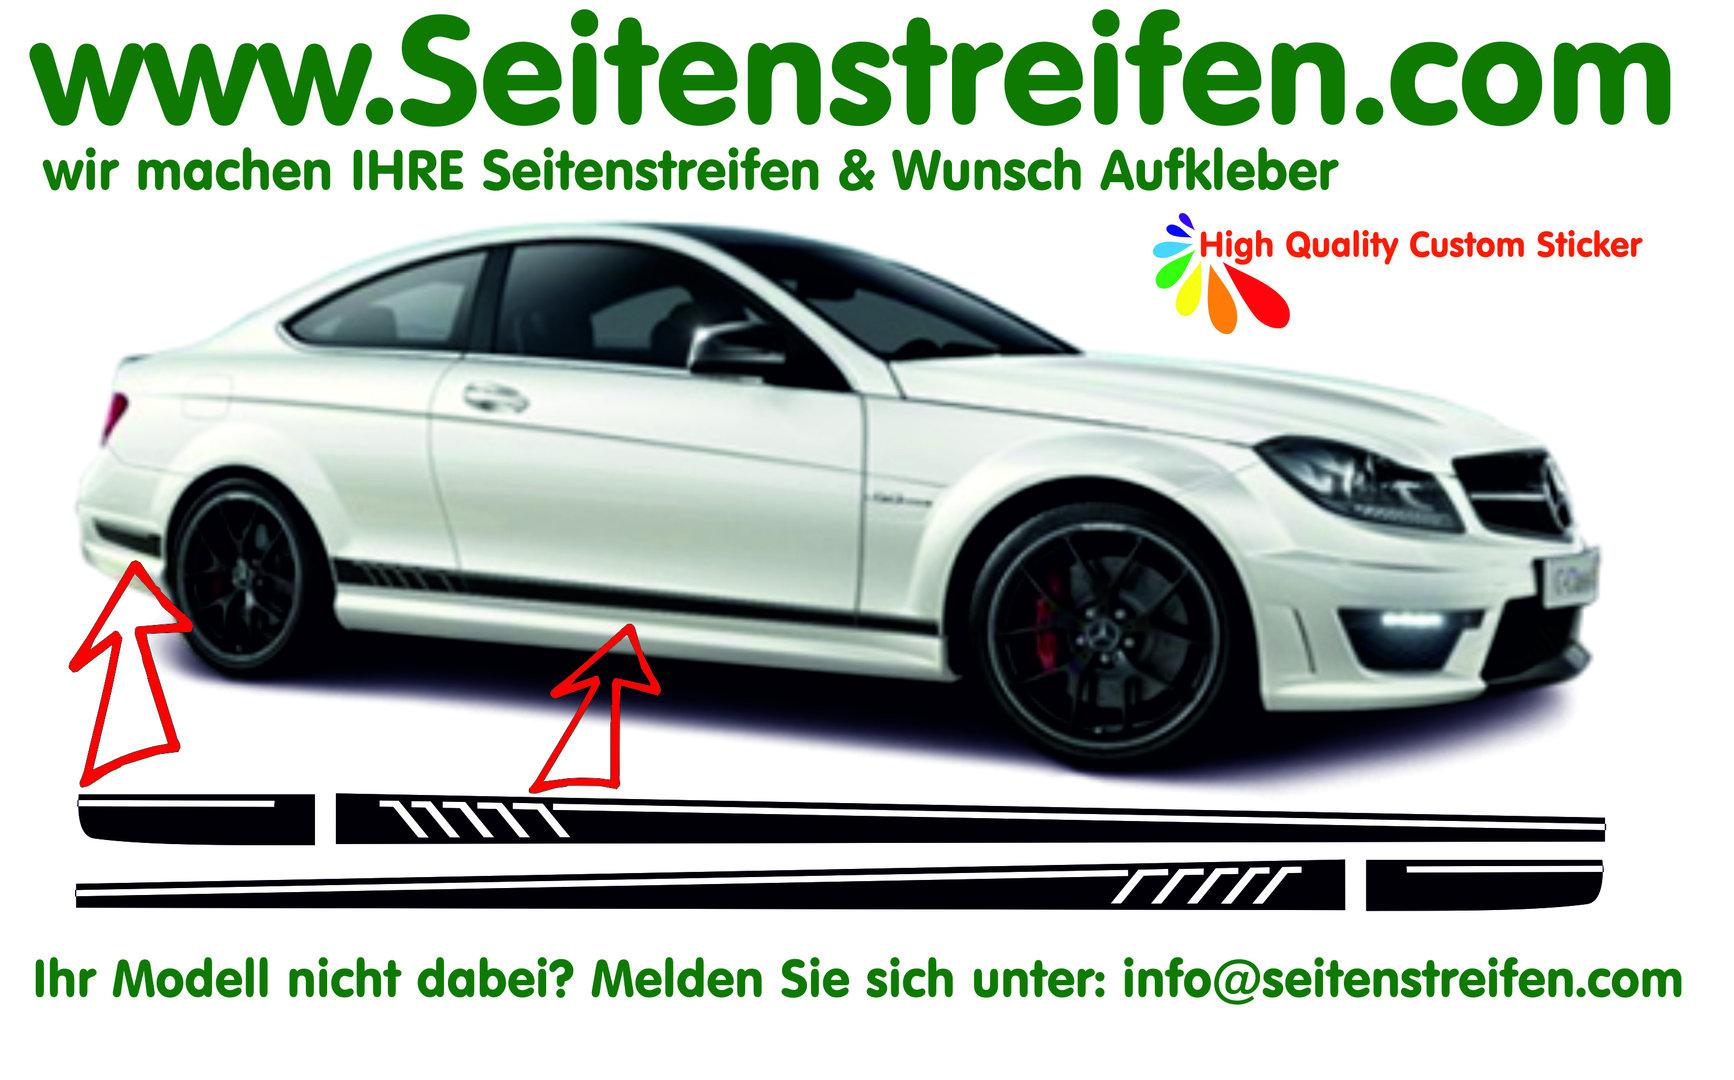 Mercedes Benz C204 C63 Coupe Amg 507 Replika Seitenstreifen Dekor Aufkleber Set Artnr 5944